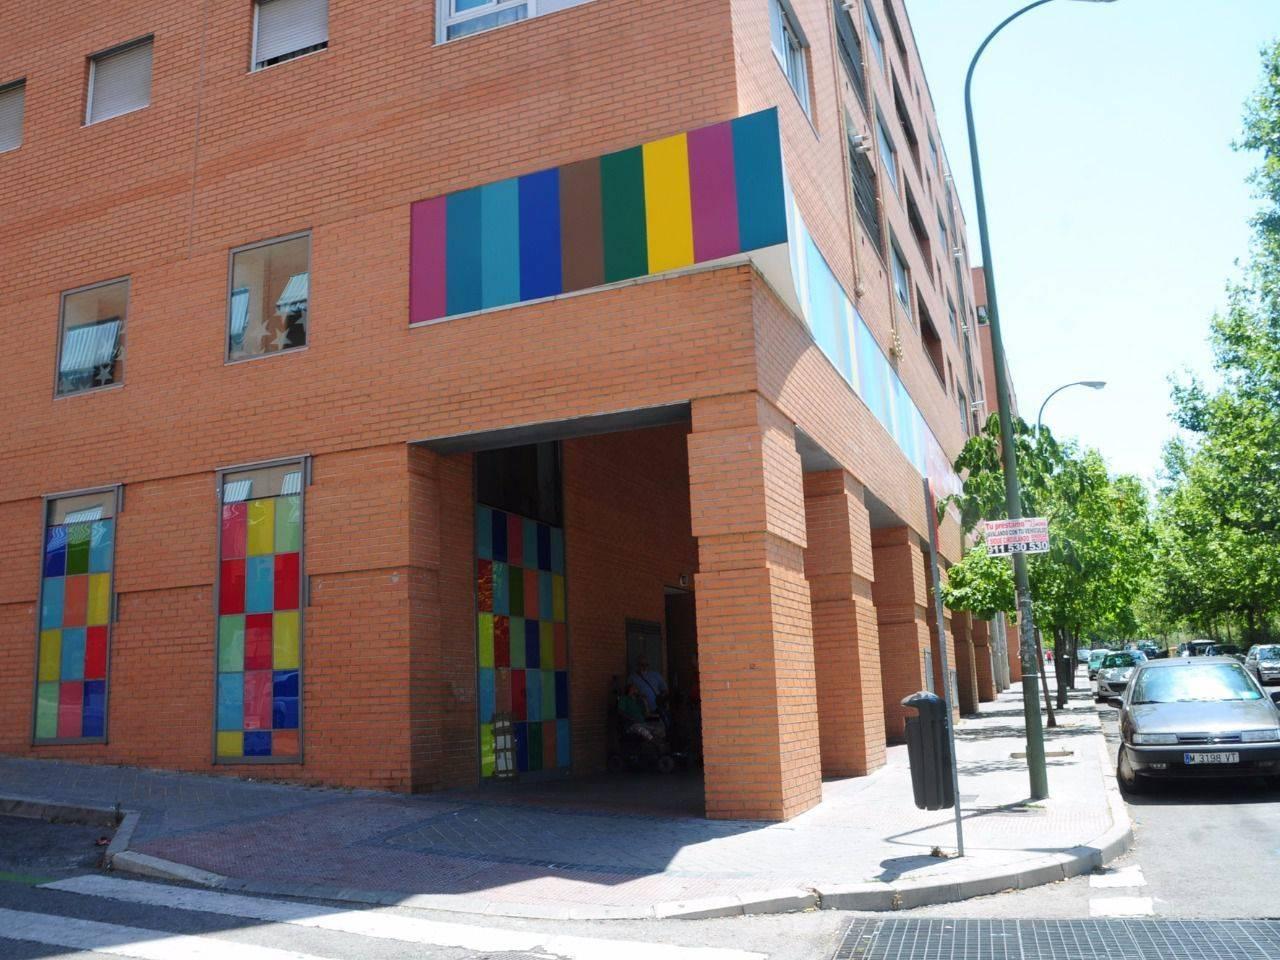 La comunidad impulsa la oficina de vivienda con m s for Oficina de vivienda comunidad de madrid